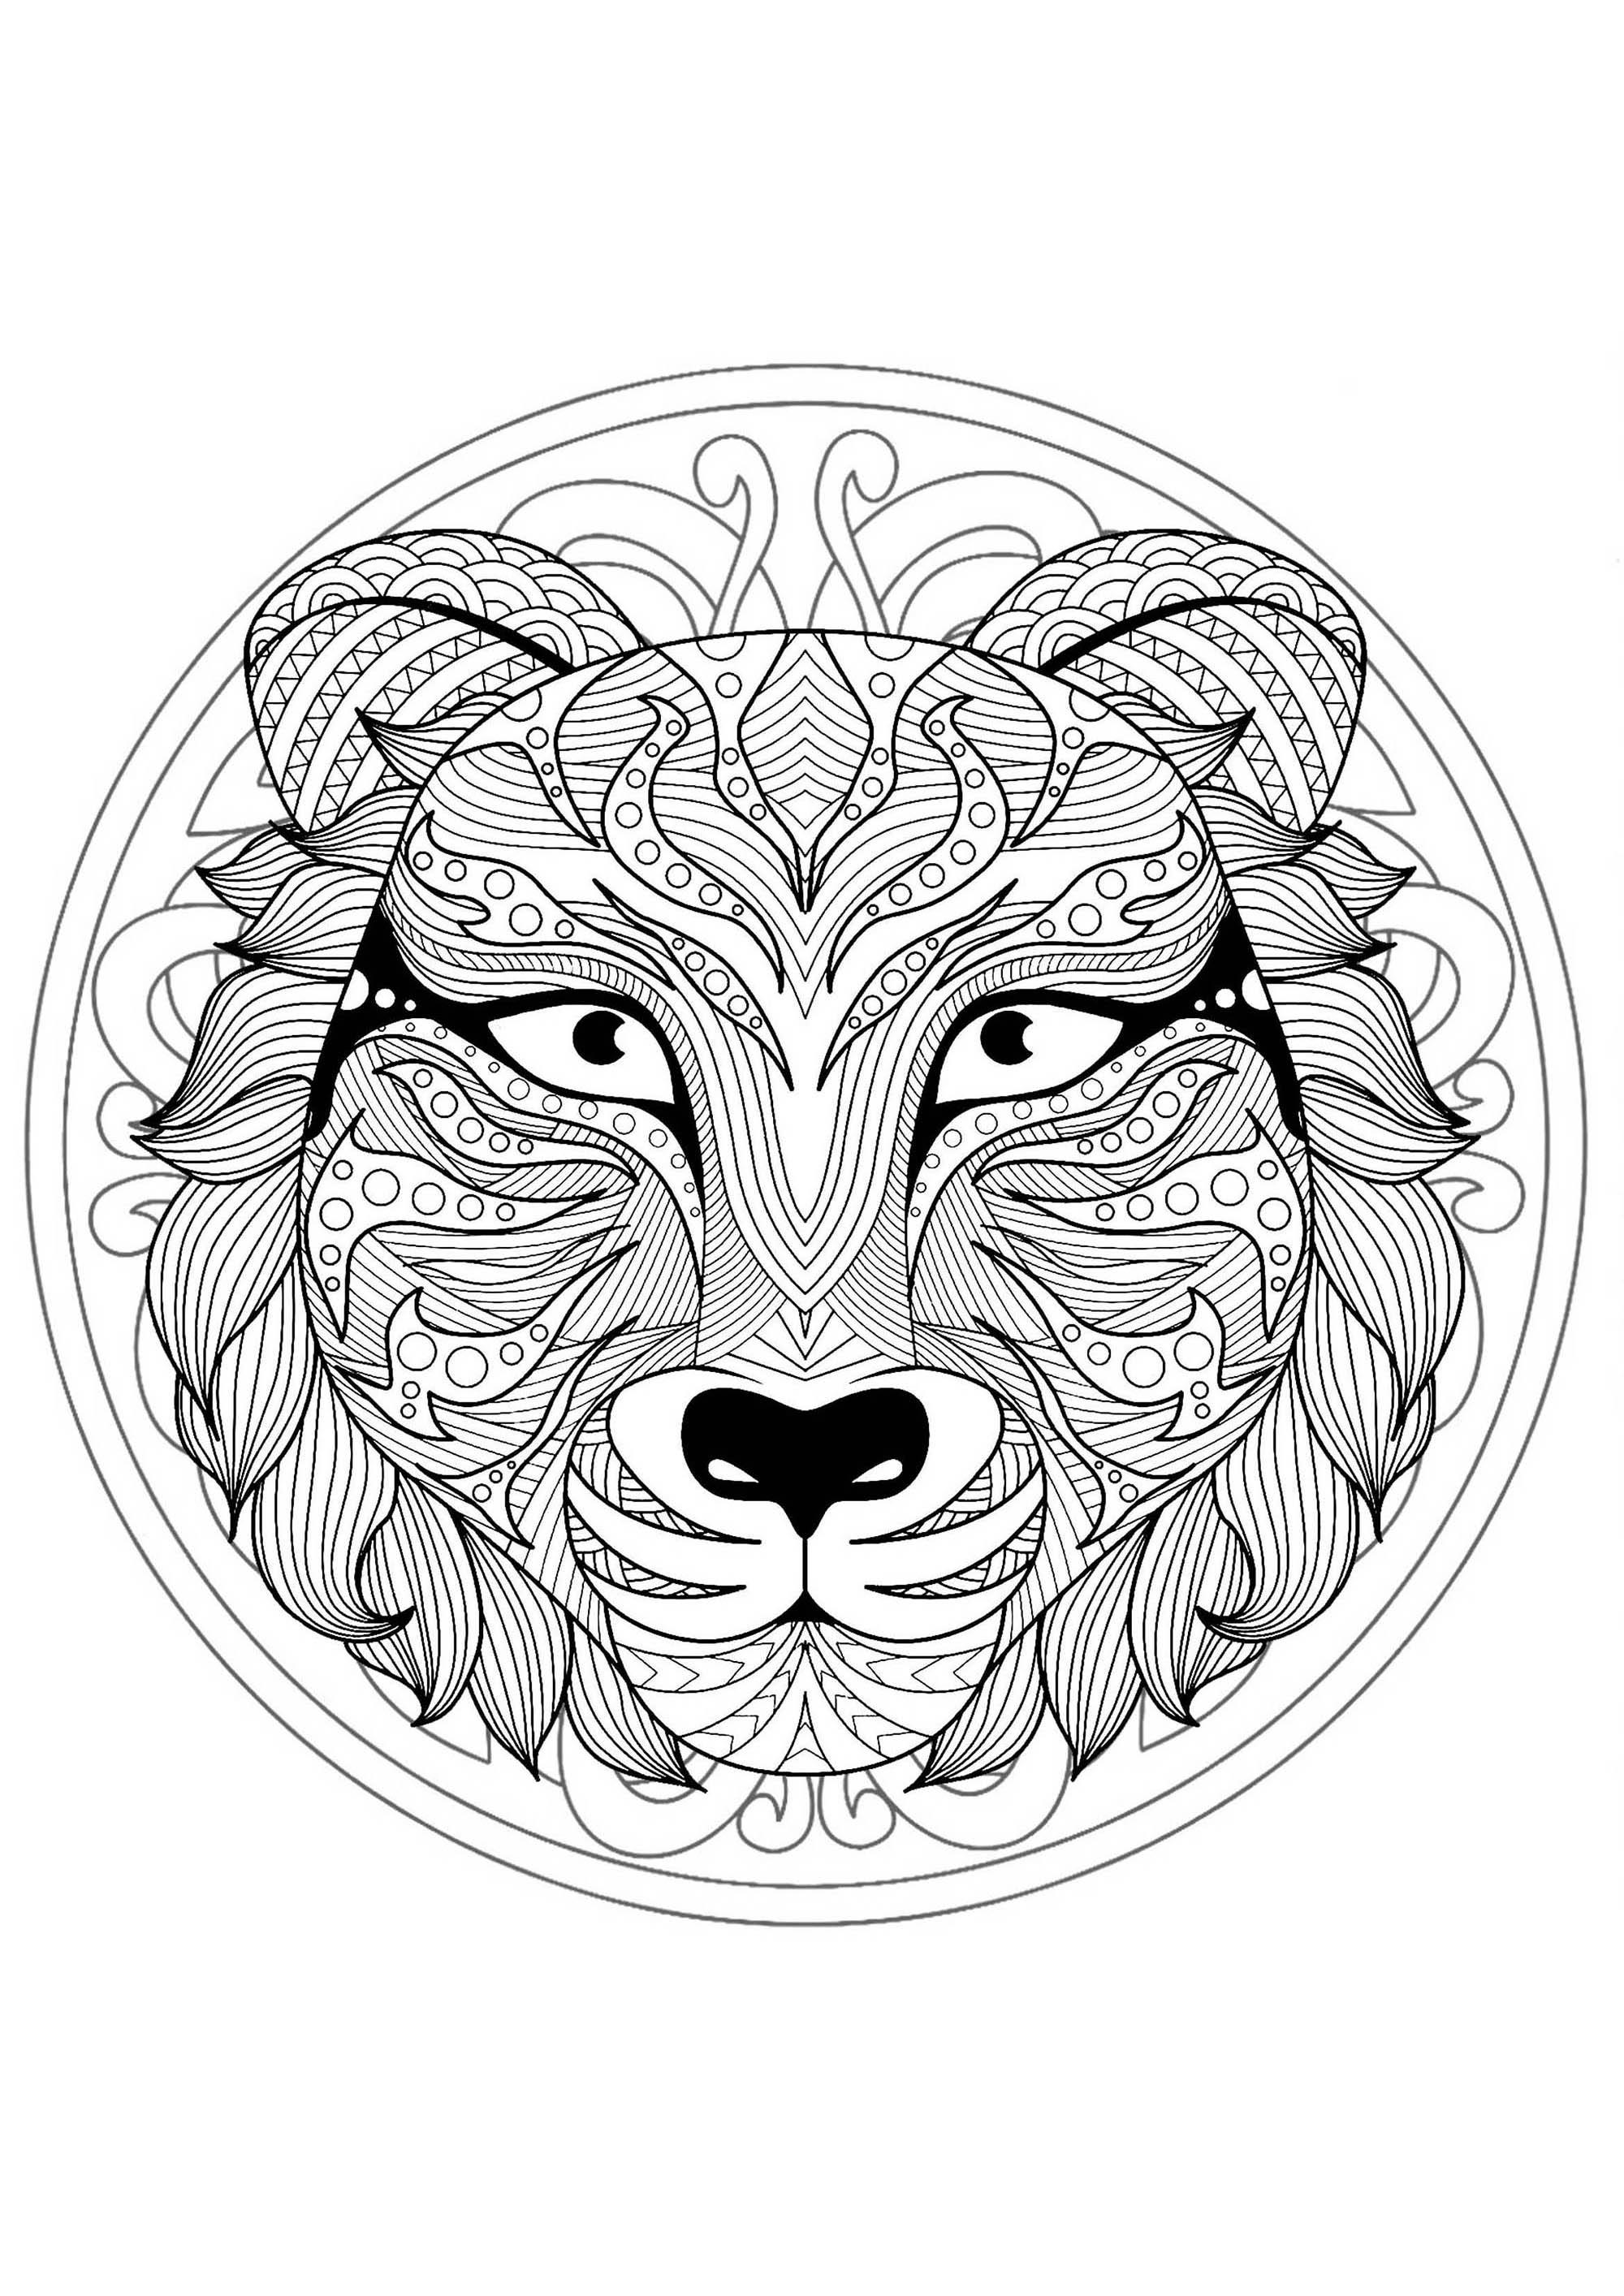 Mandala With Gorgeous Wolf Head And Geometric Patterns